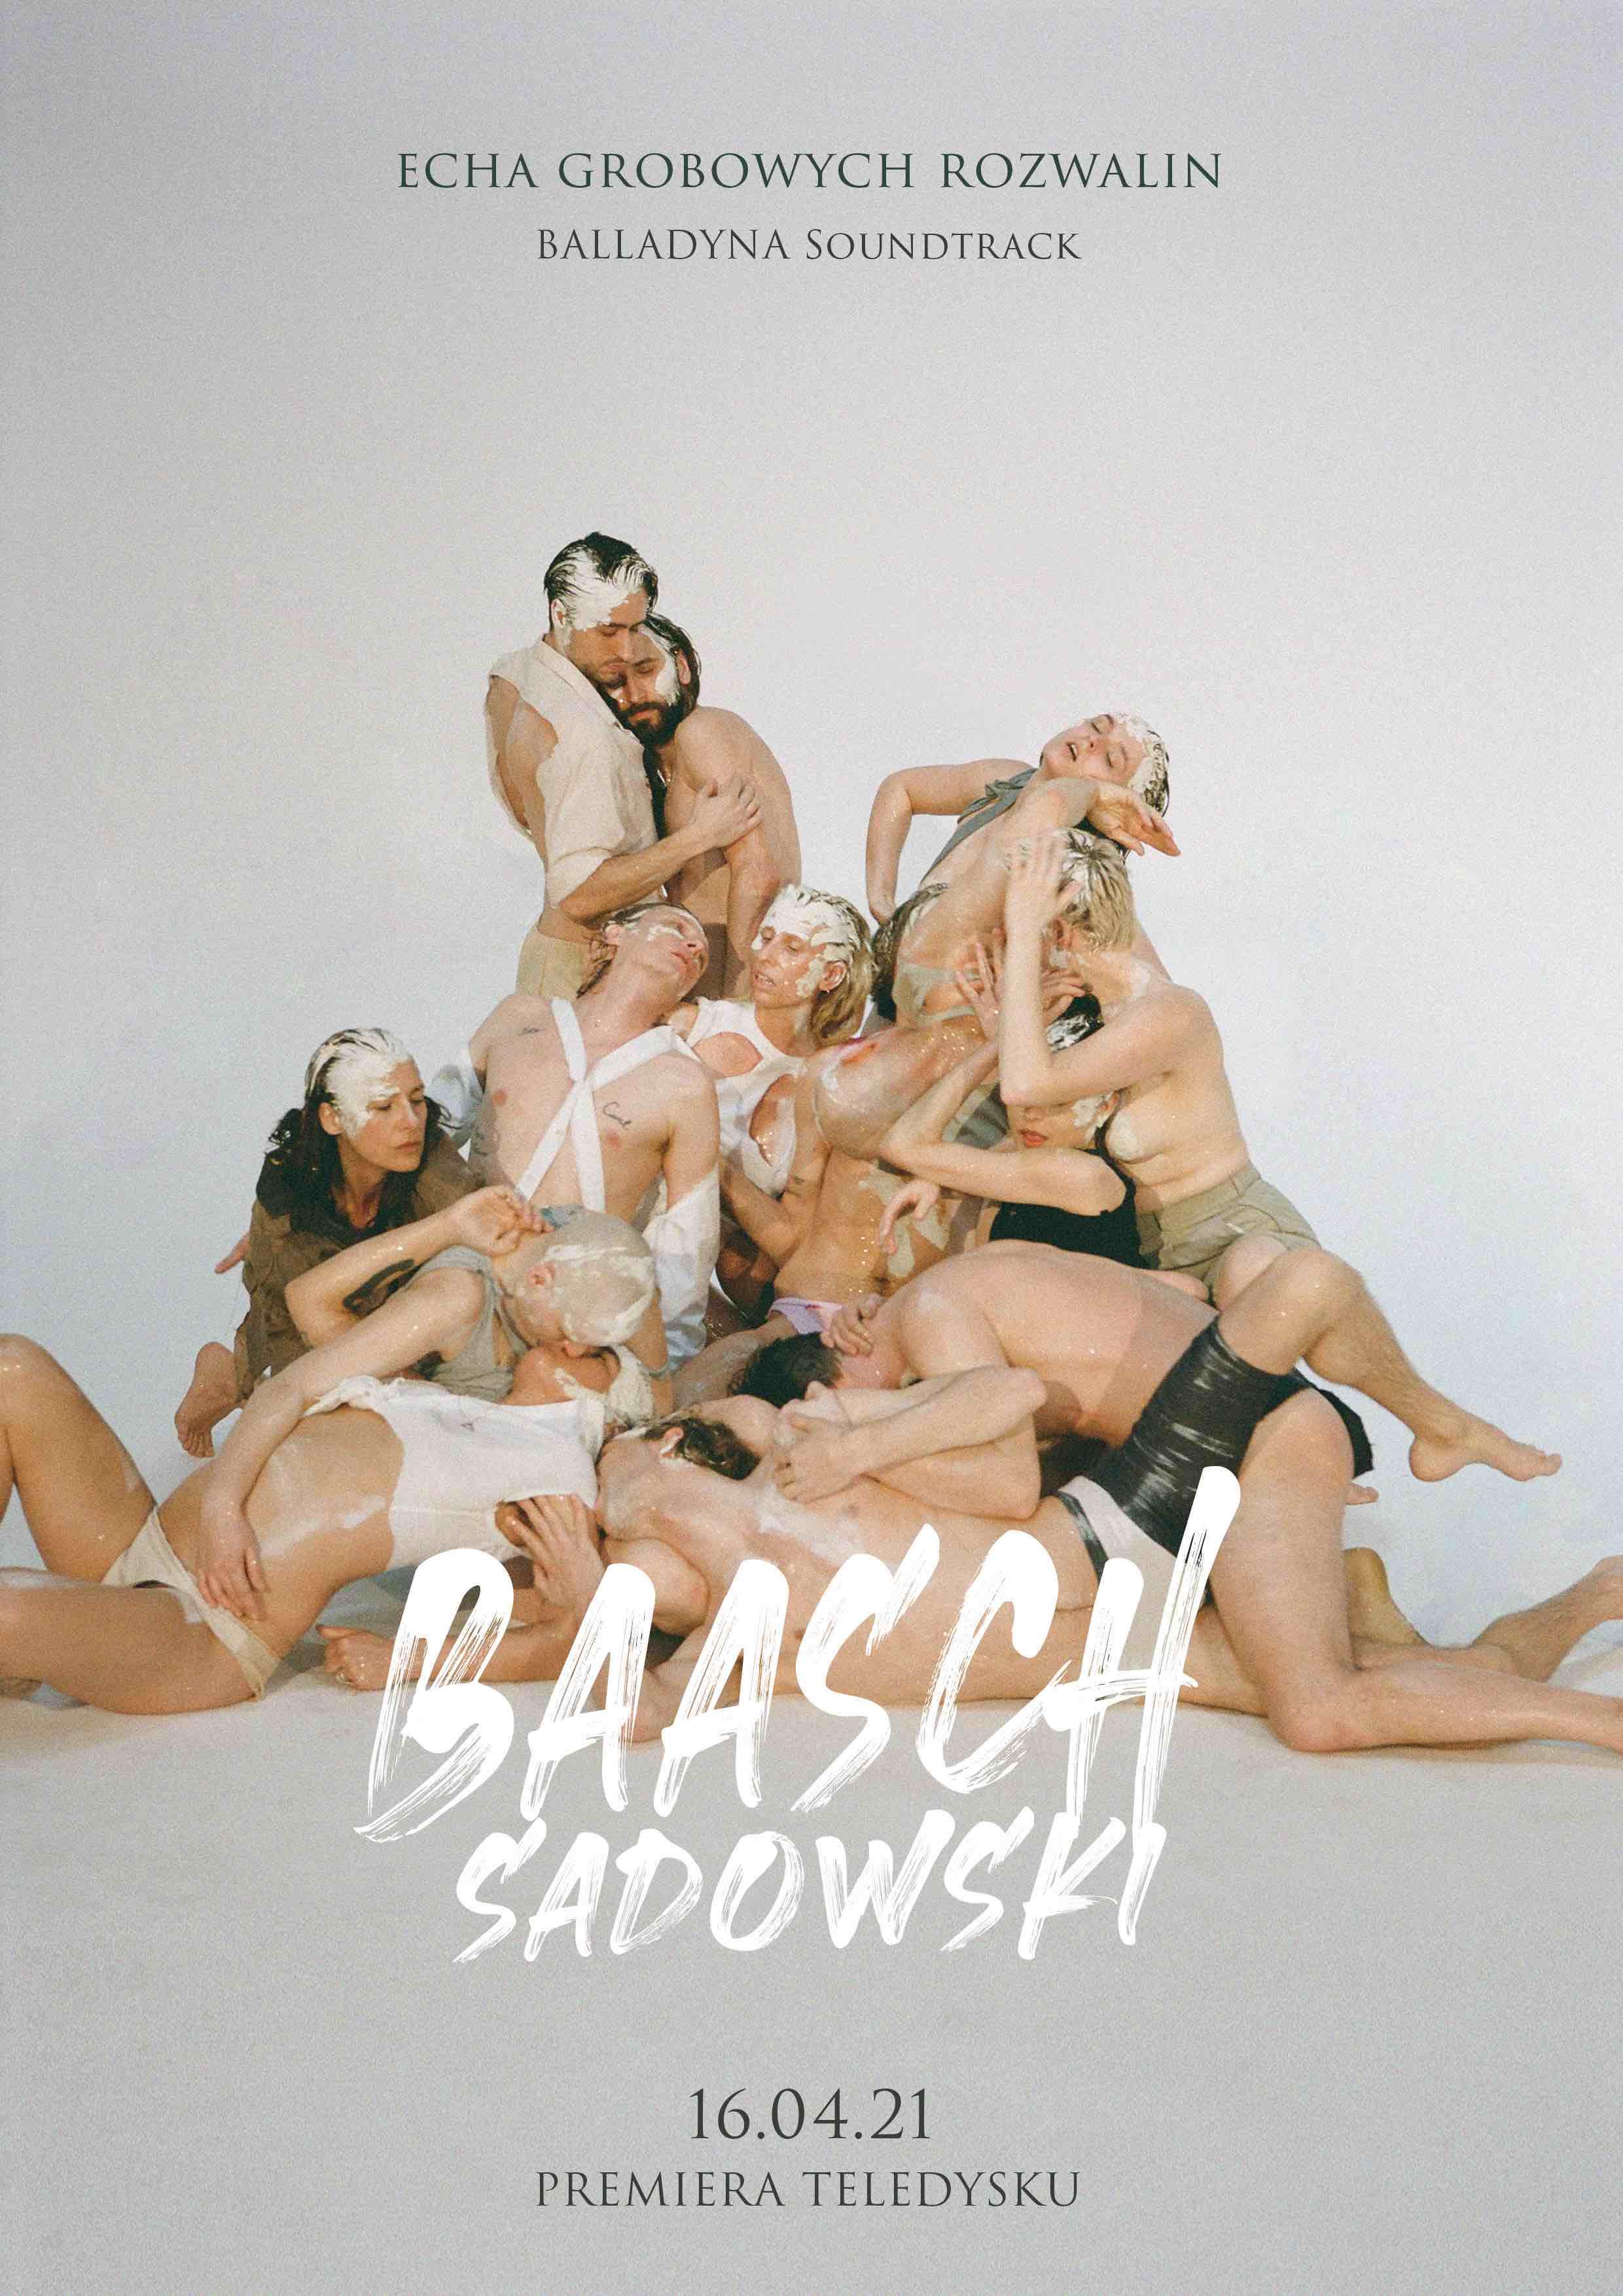 Baasch x Sadowski